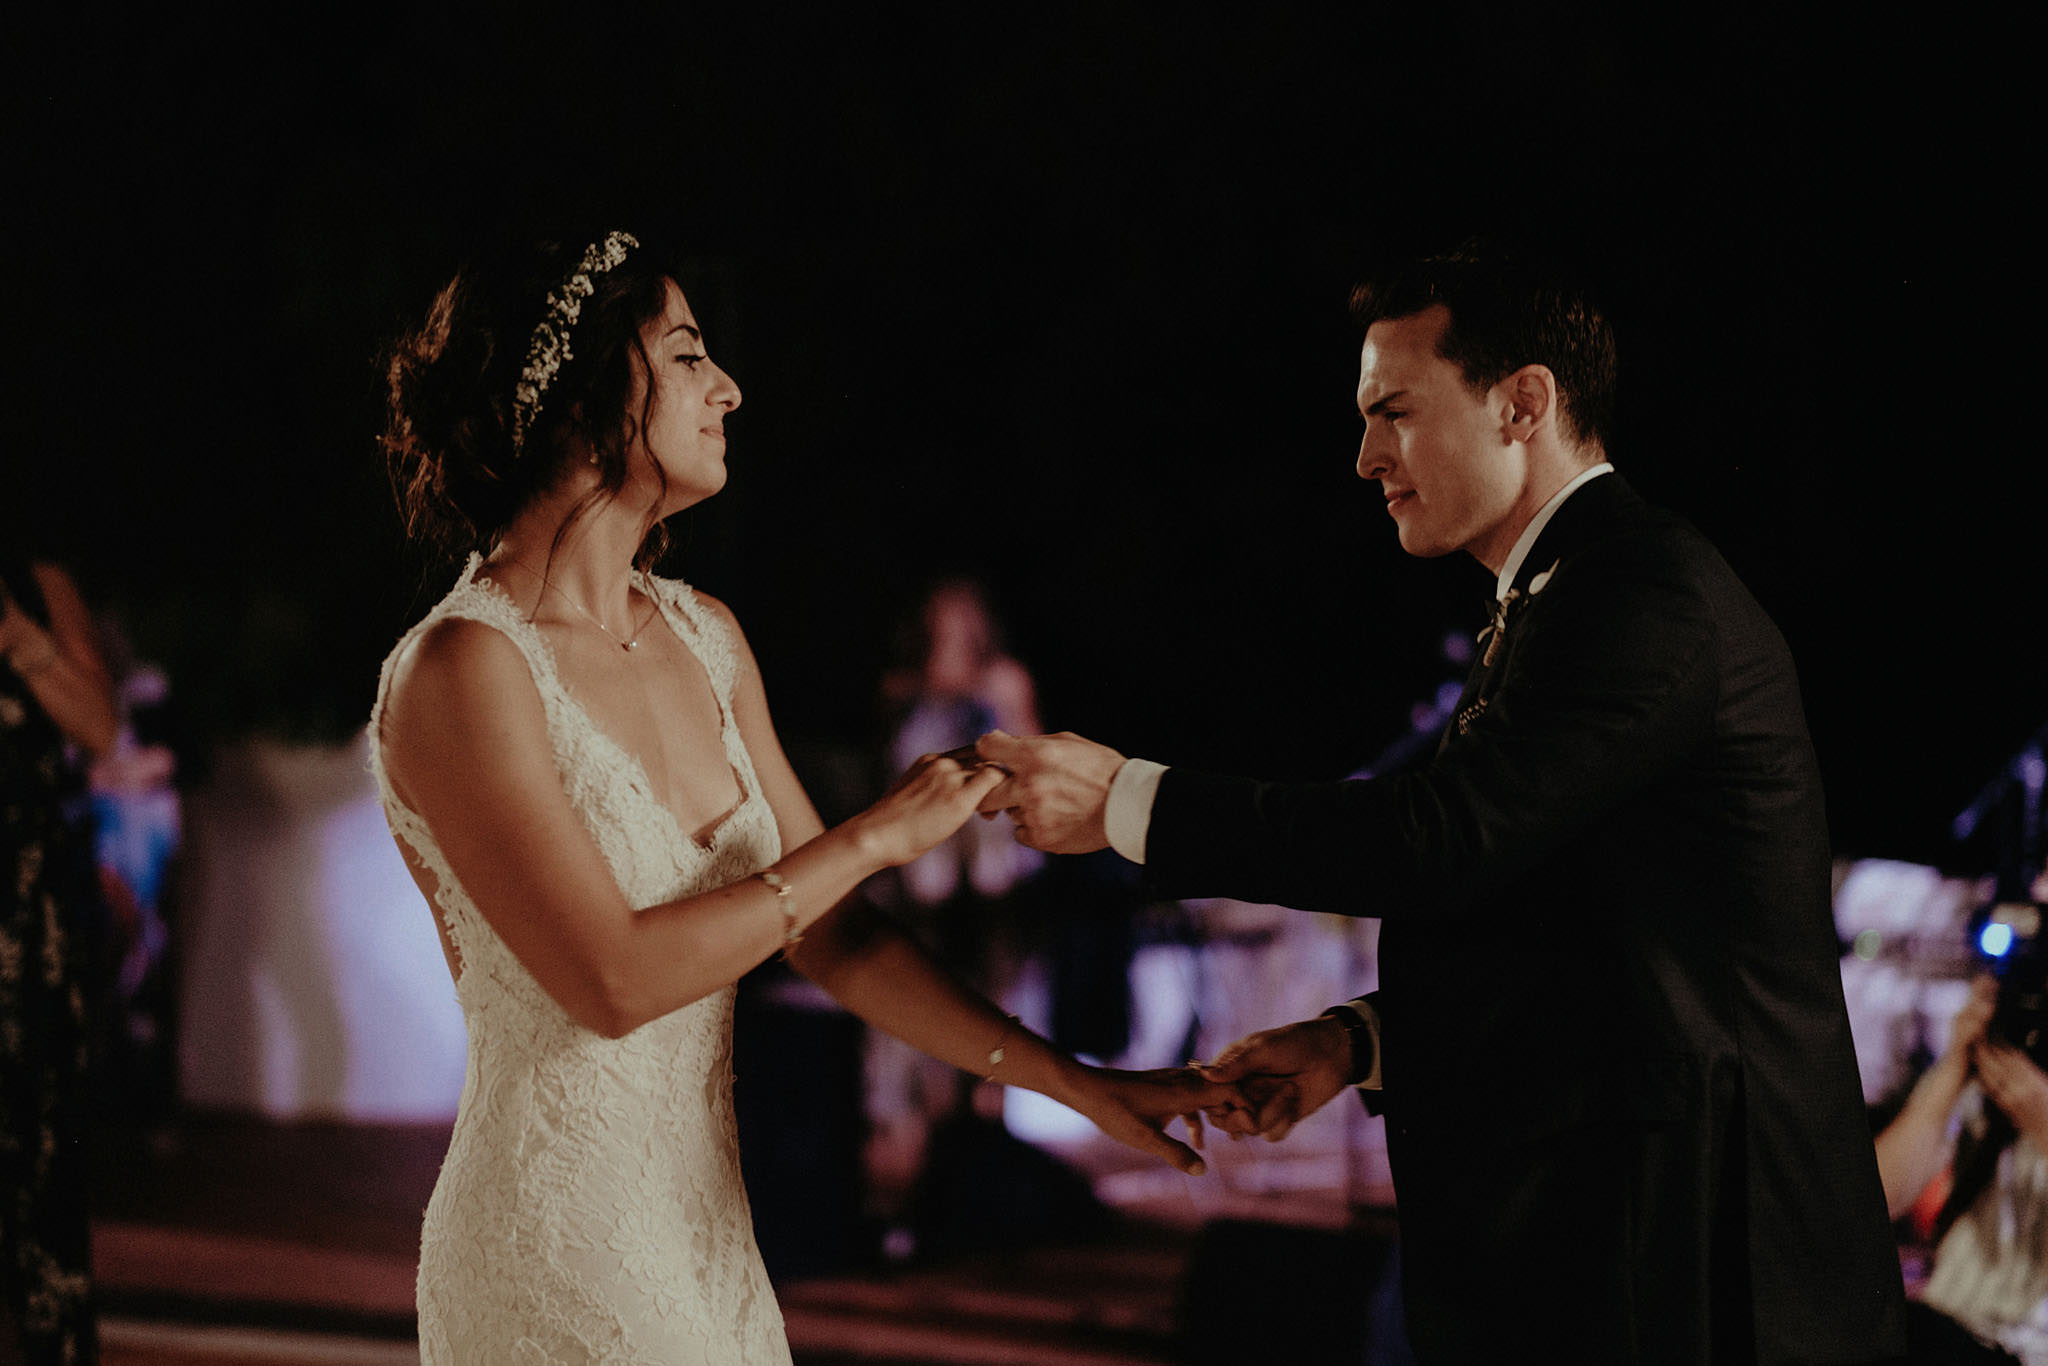 Max-Steph-Italy-Wedding-705.jpg